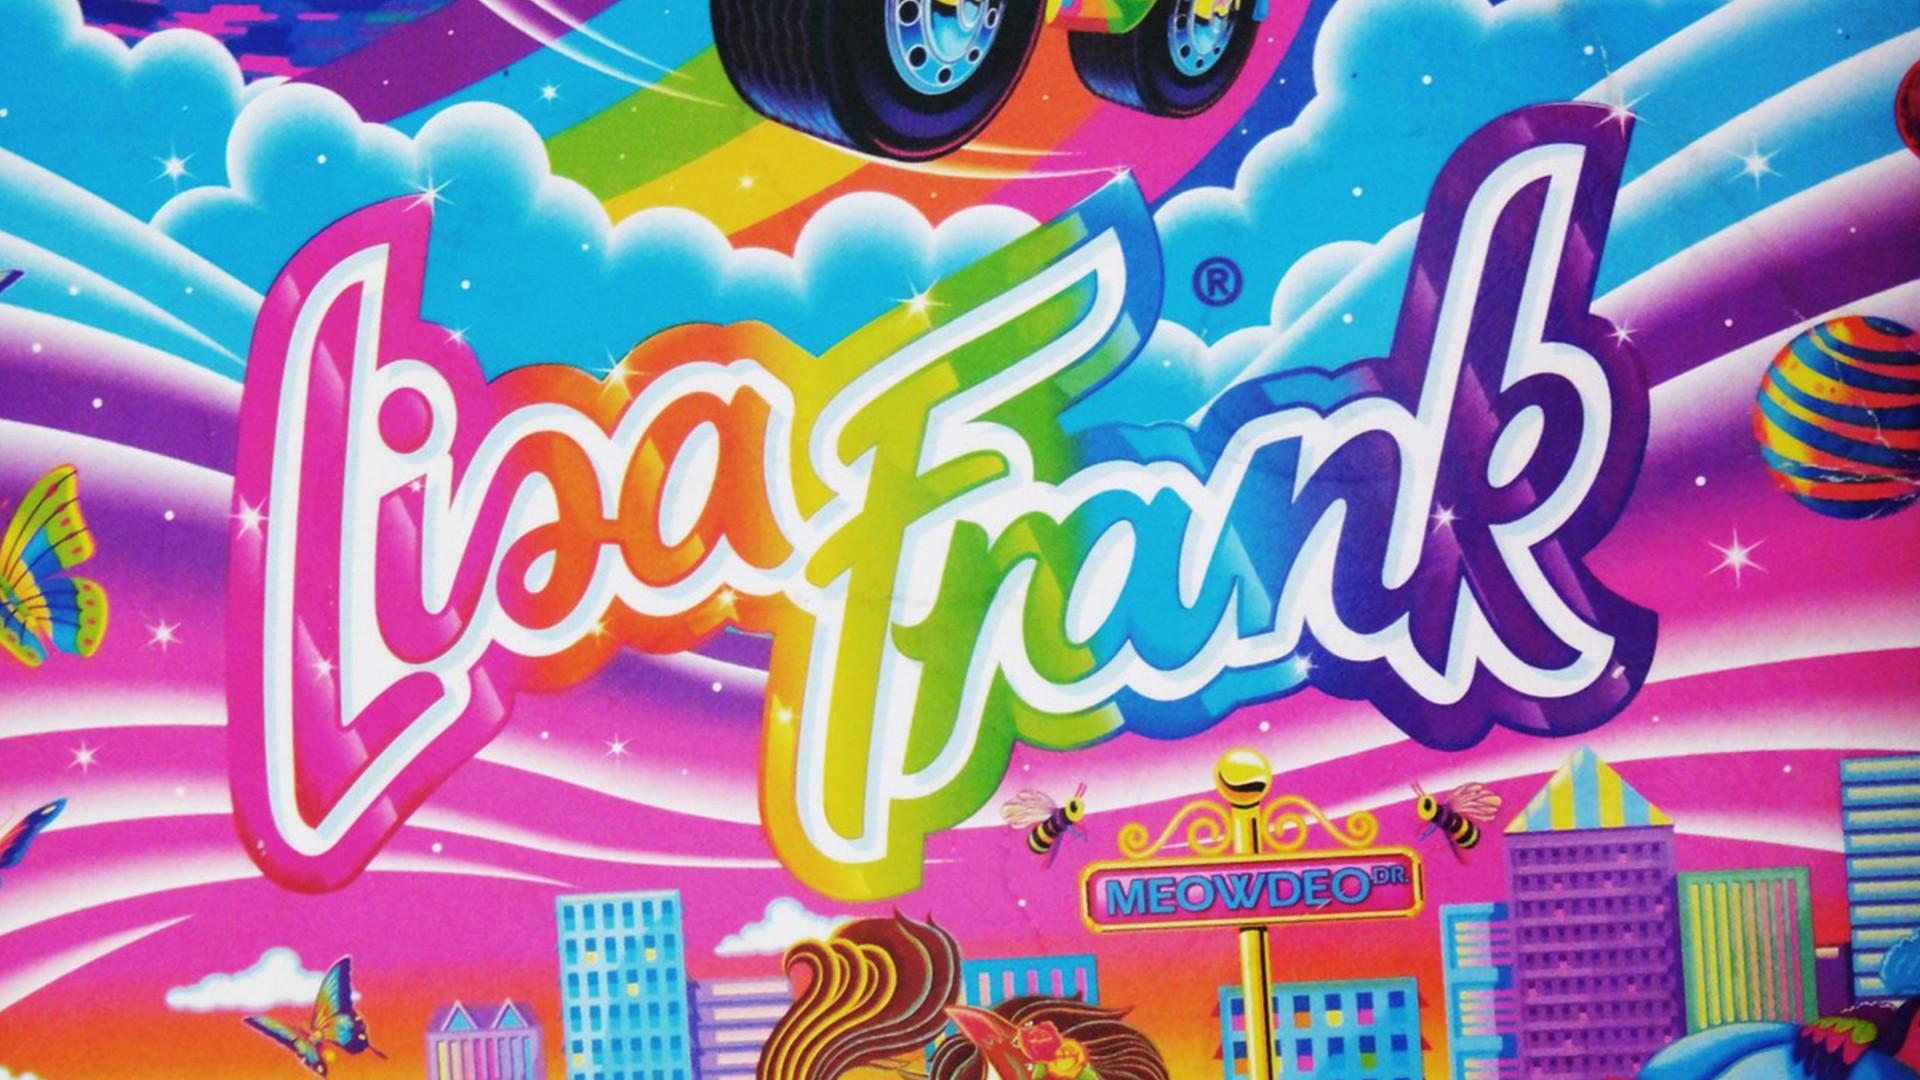 Lisa Frank Wallpapers – Wallpaper Cave